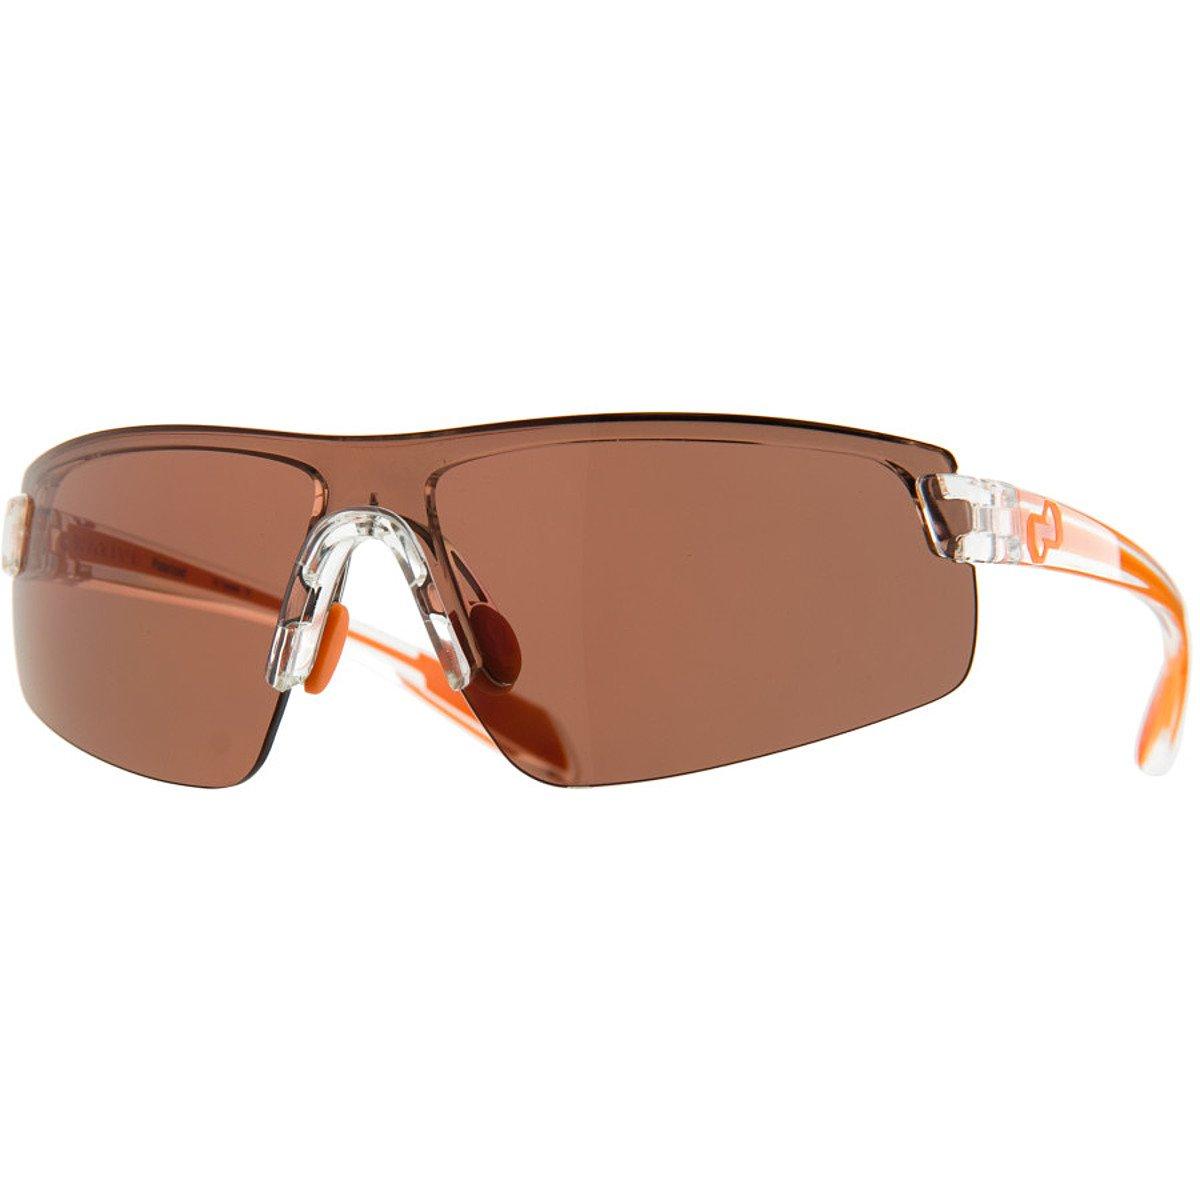 Native Lynx Polarized Sunglasses, Copper, Crystal / Orange